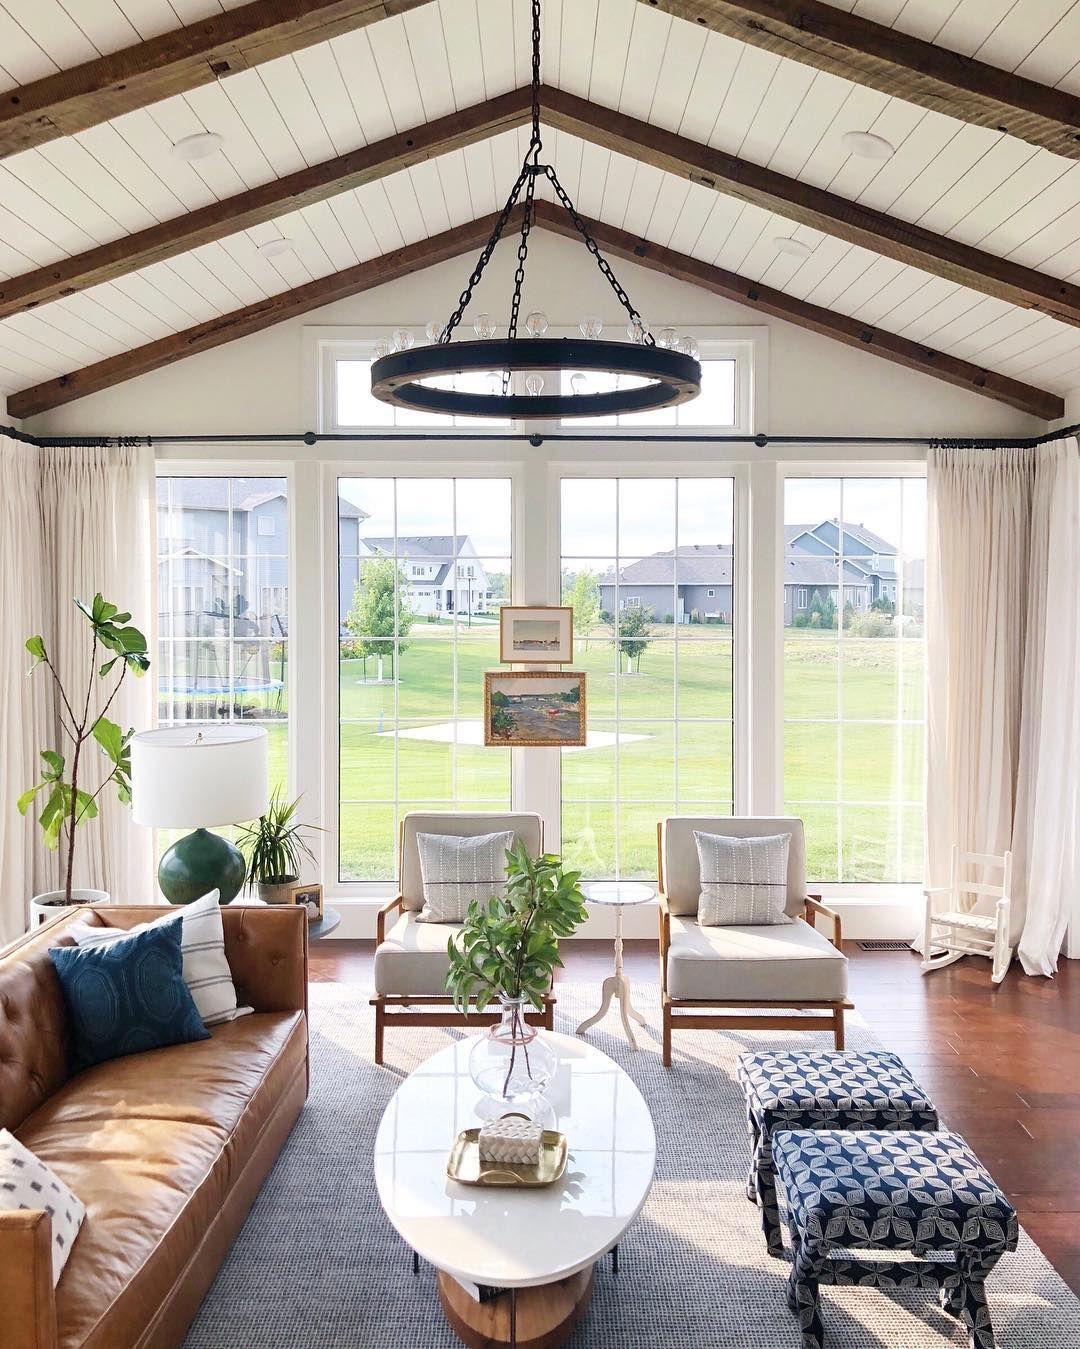 Interior Sunroom Addition Ideas: Pin By Callie Gibson On Interior Decor Creative Ideas